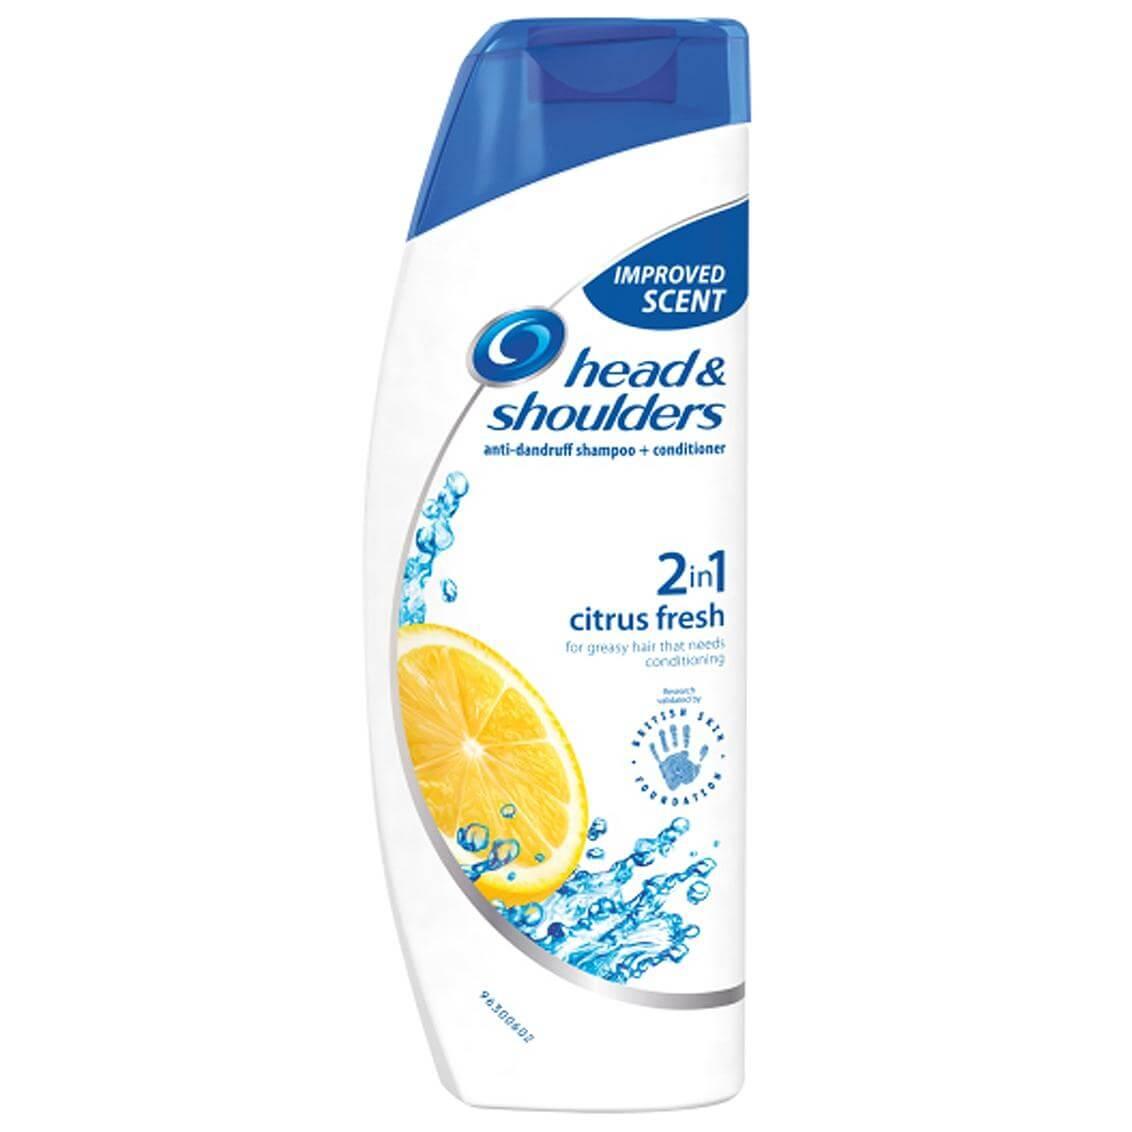 Head & Shoulders 2 σε 1 Αντιπιτυριδικό Σαμπουάν & Conditioner Citrus Fresh με Λεμόνι για Αίσθηση Φρεσκάδας 360ml